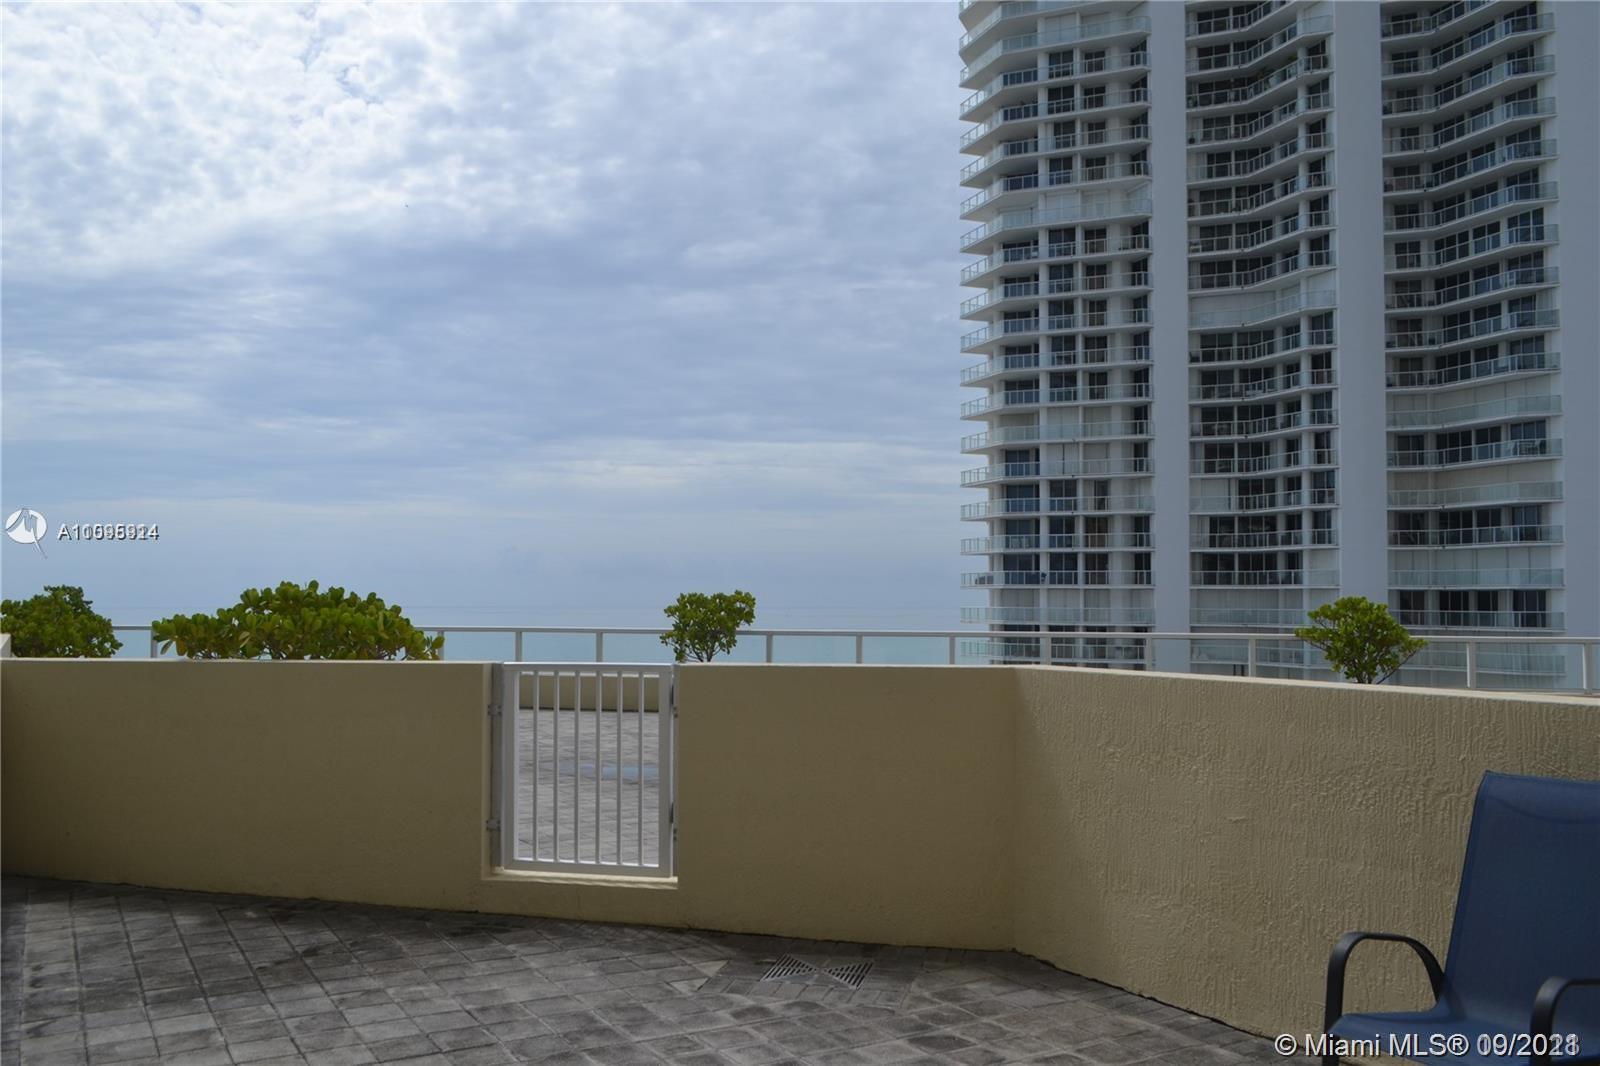 La Perla #CABANA01 - 16699 Collins Ave #CABANA01, Sunny Isles Beach, FL 33160